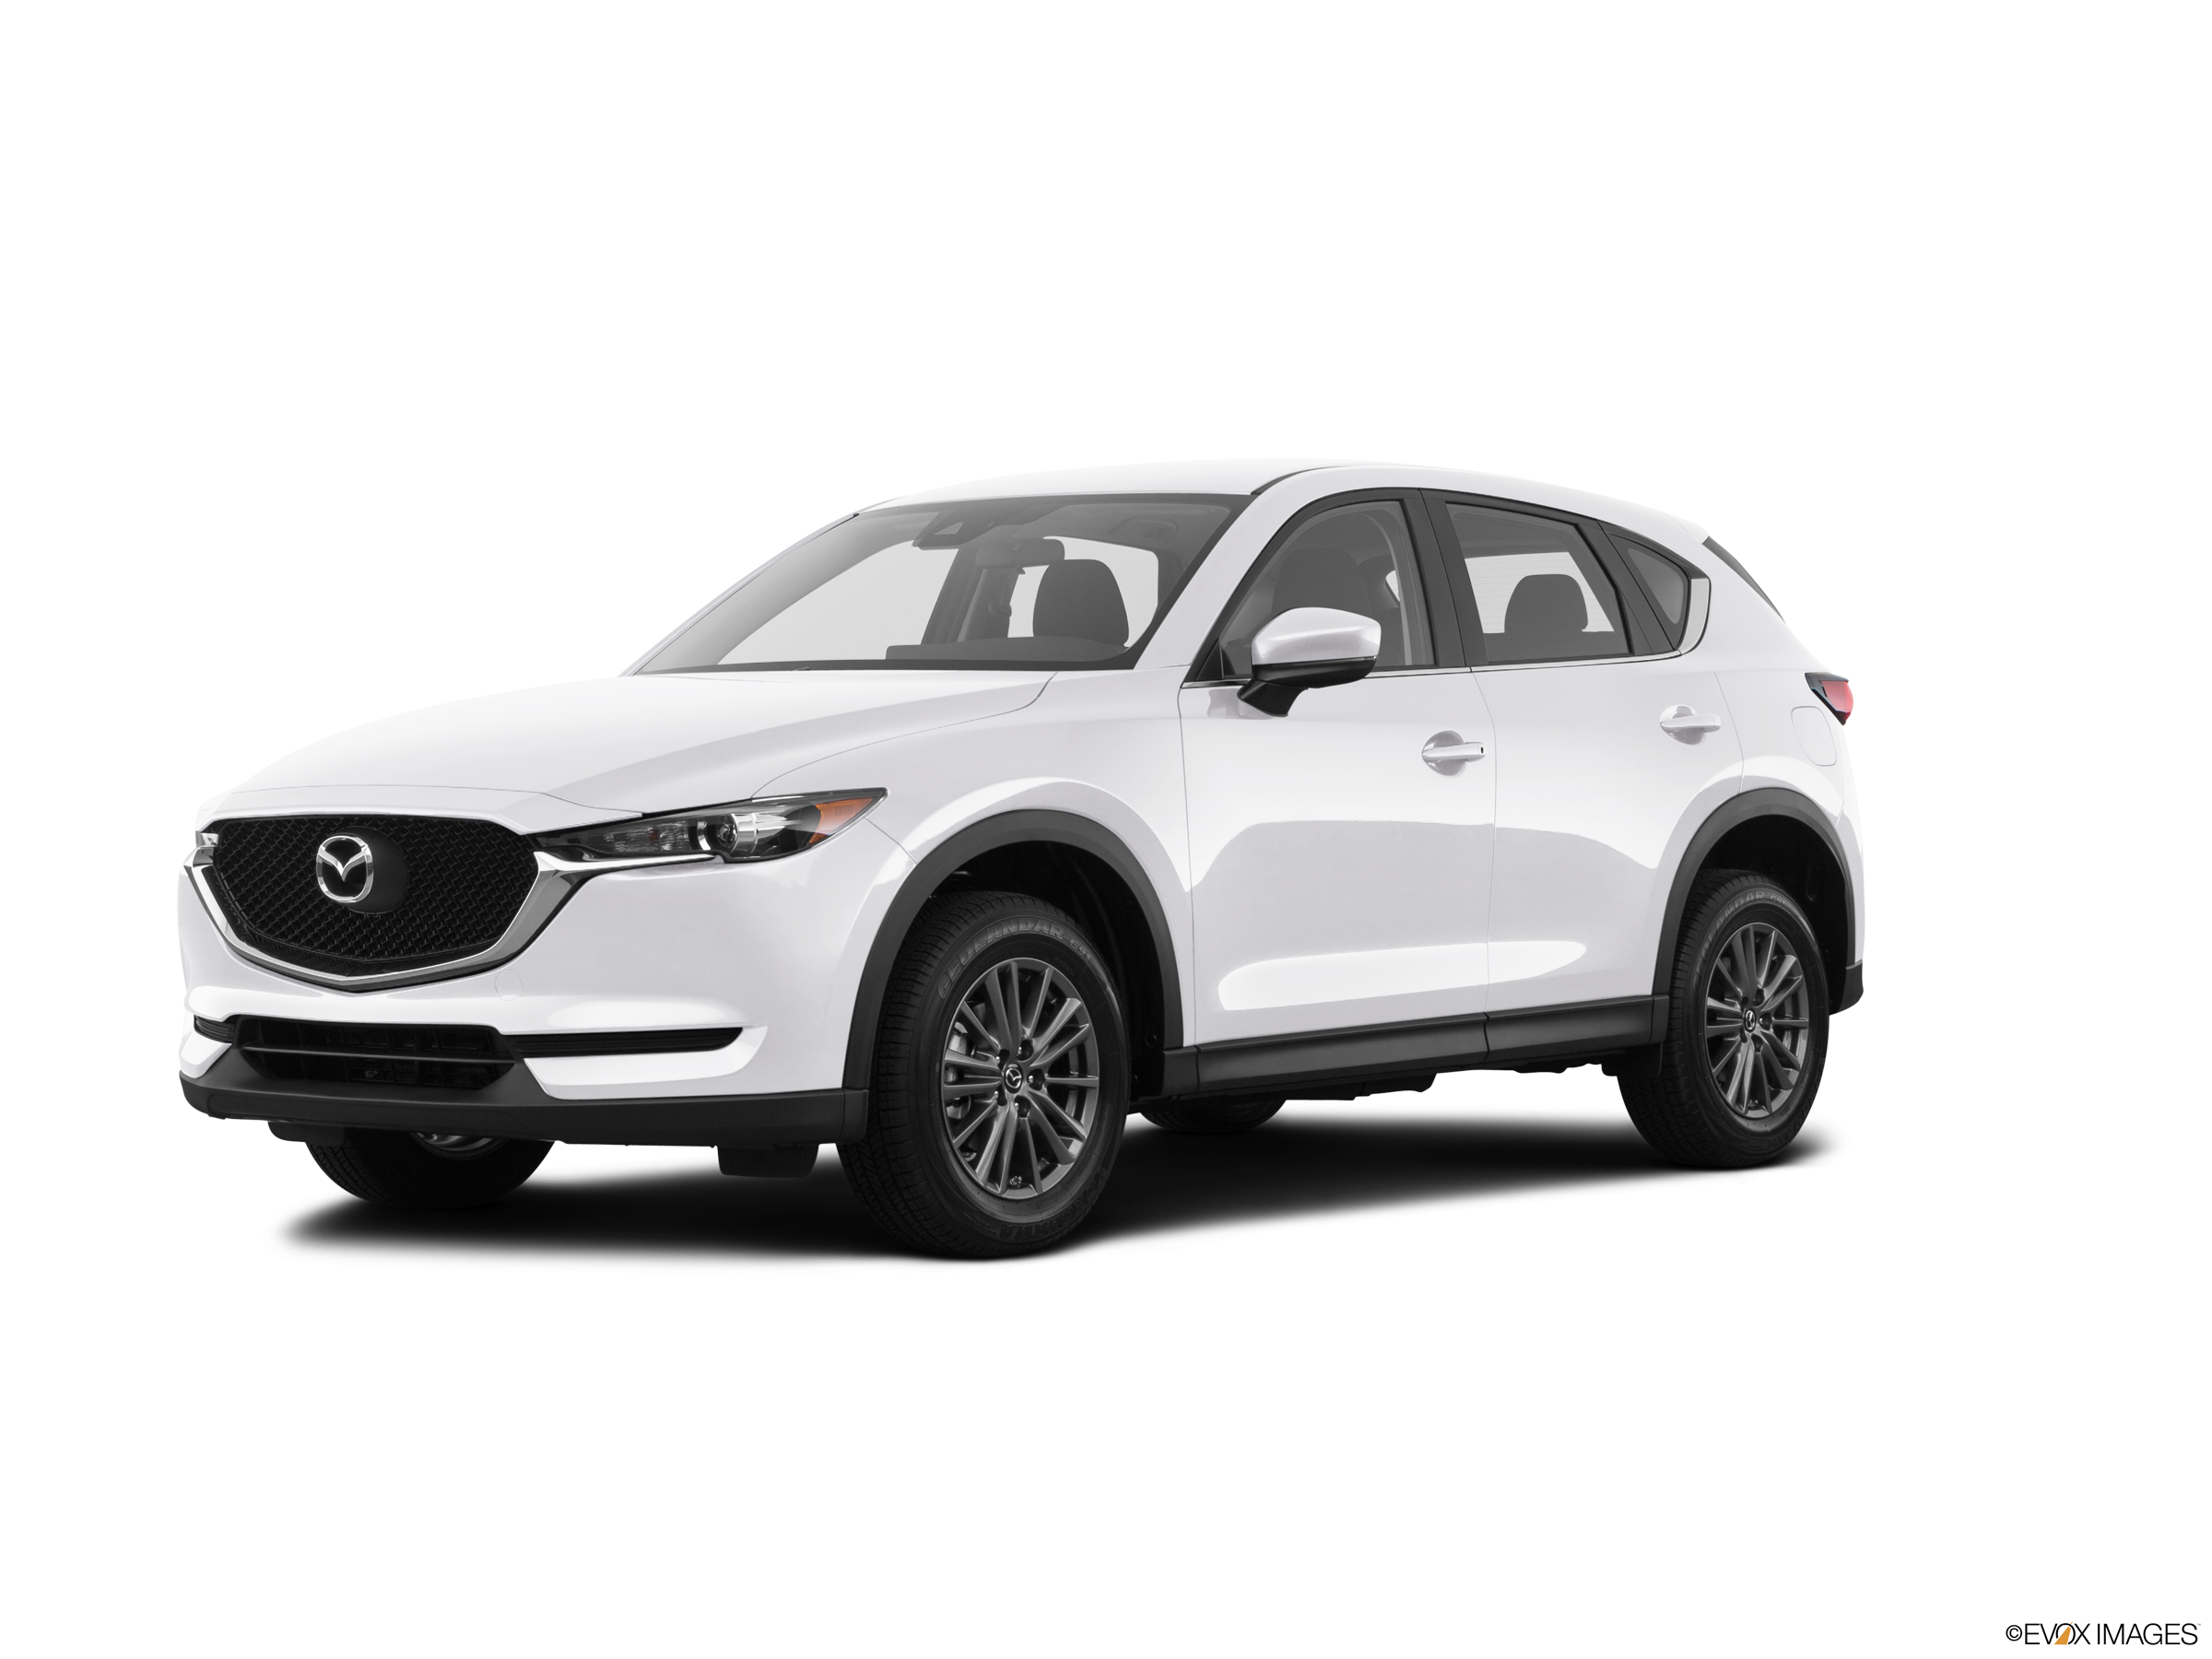 Kelebihan Kekurangan Mazda X5 Review